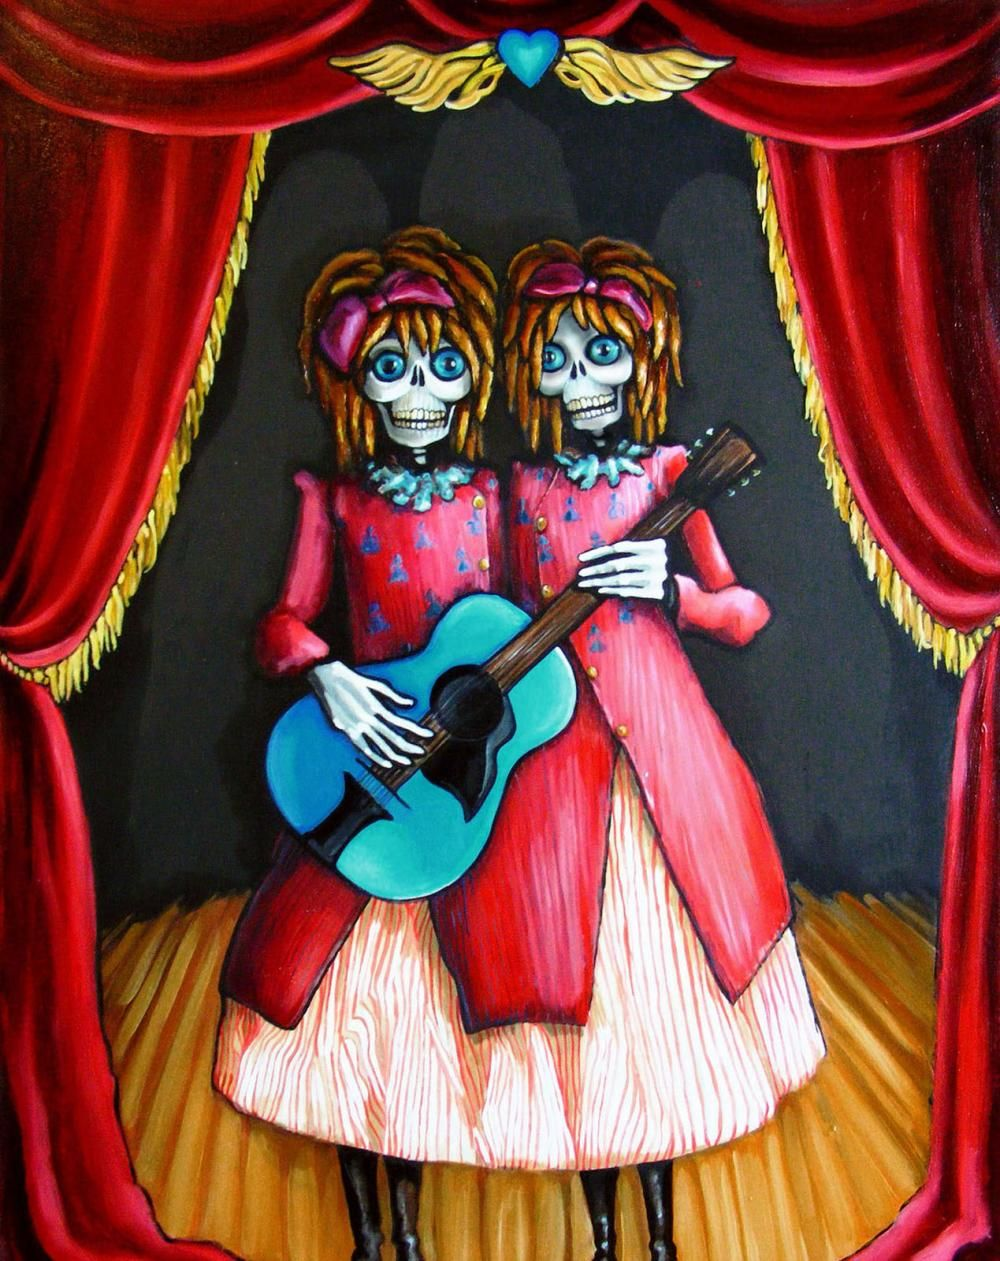 Twin guitar